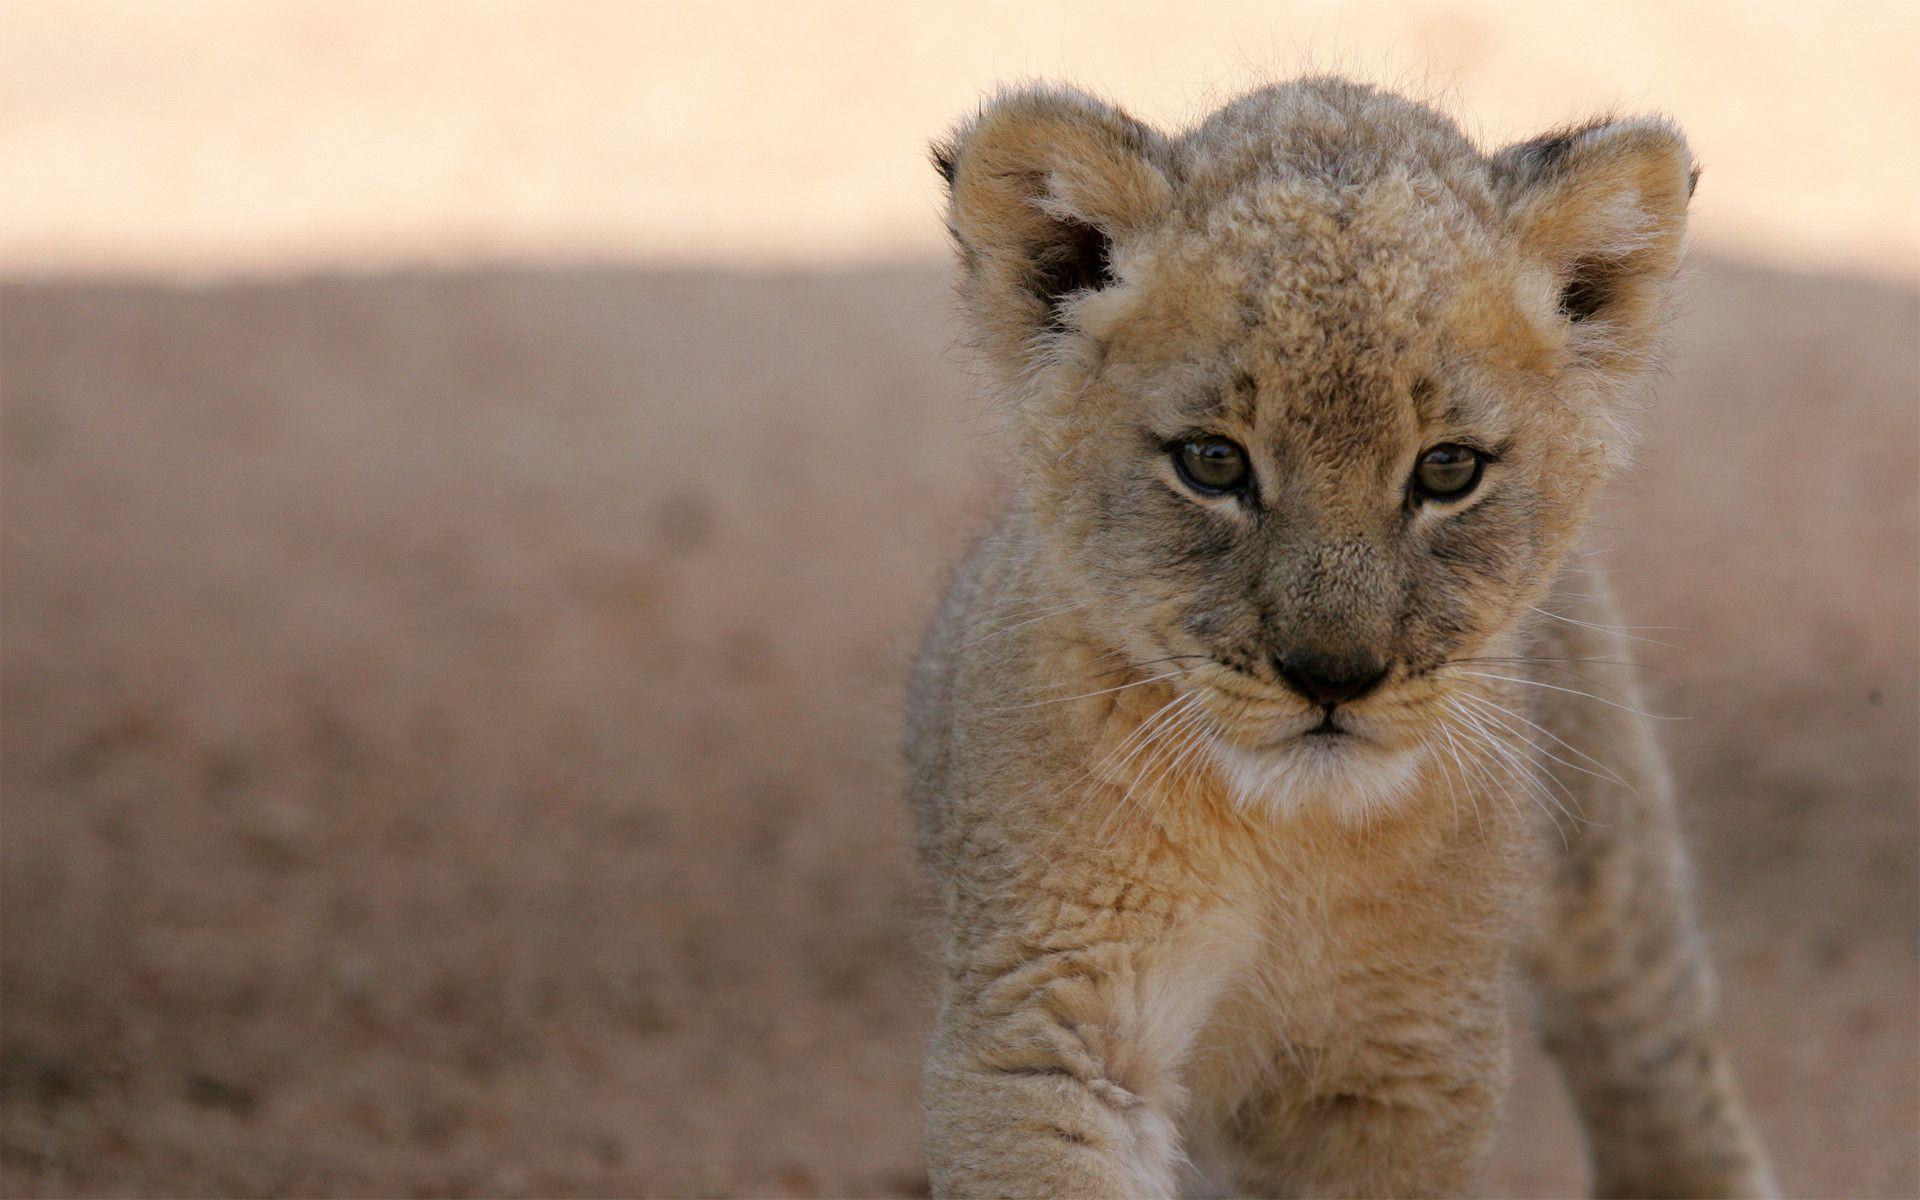 Cute Small Girl Full Hd Wallpaper Lion Cub Wallpapers Wallpaper Cave